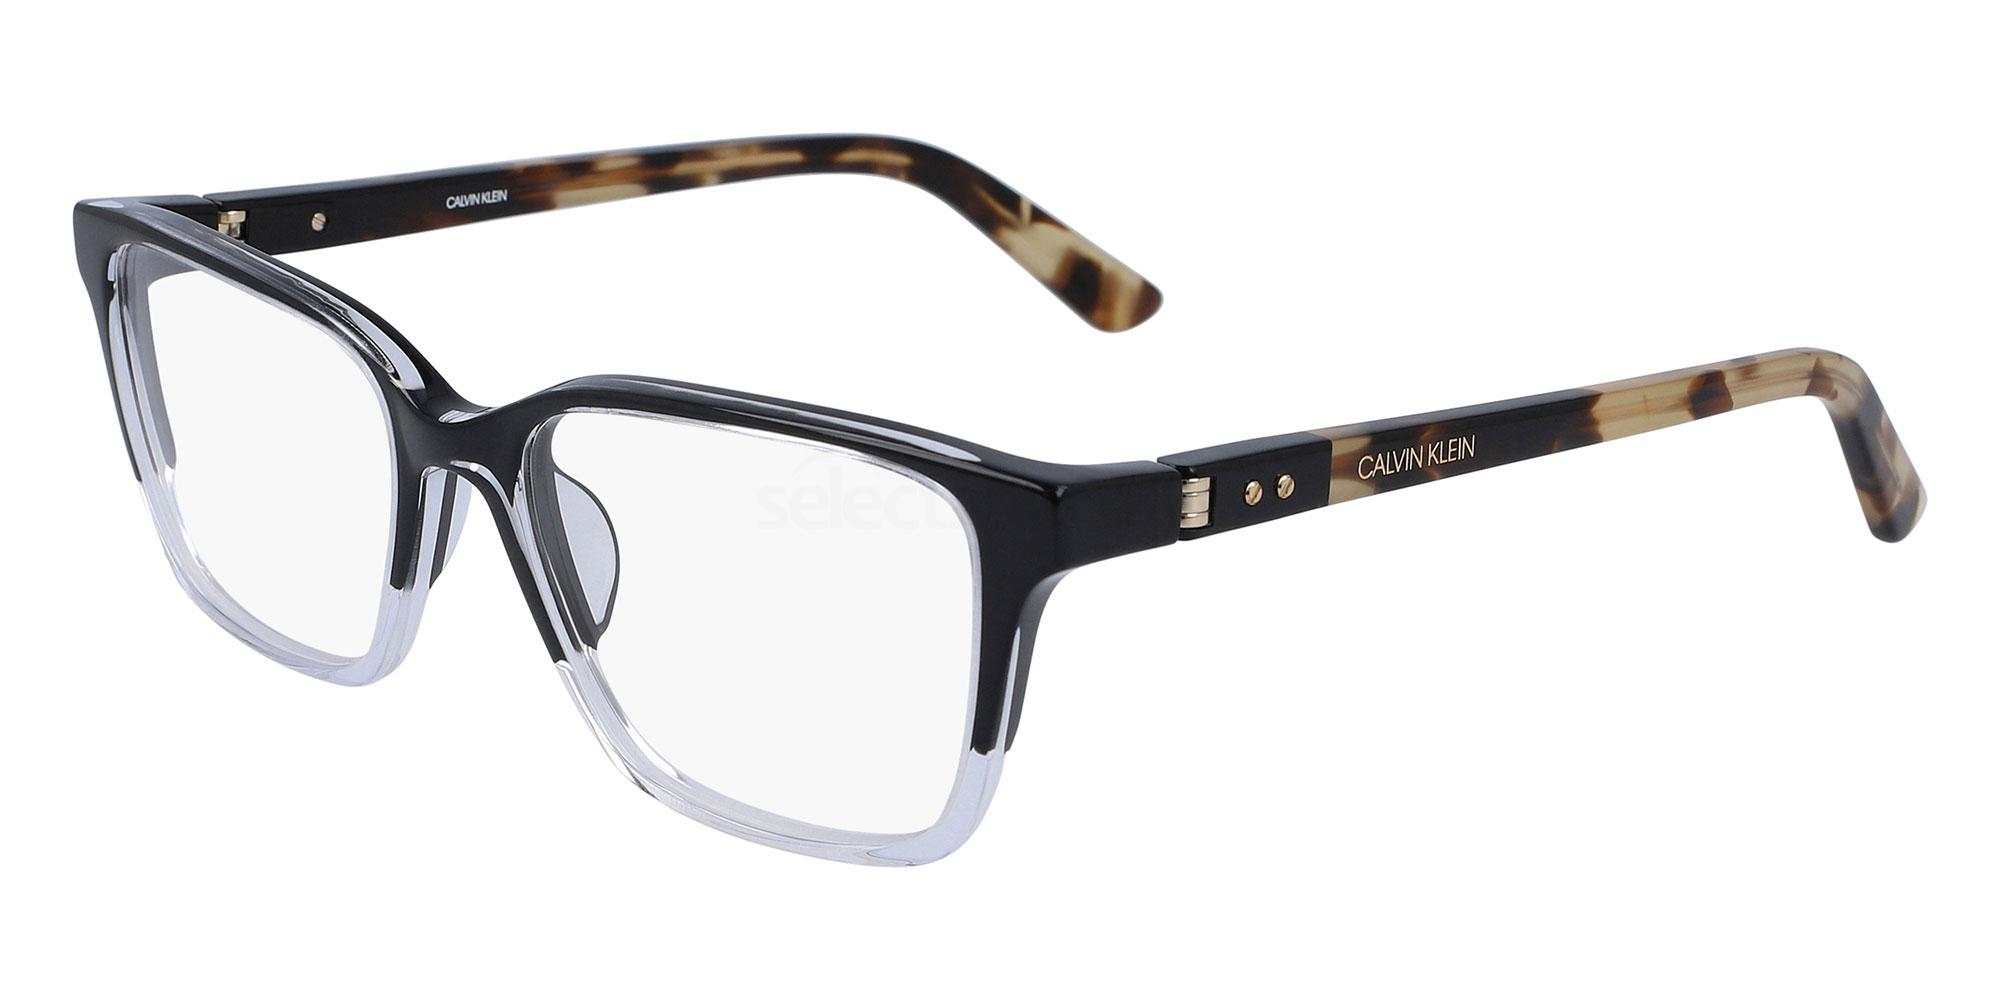 095 CK19506 Glasses, Calvin Klein